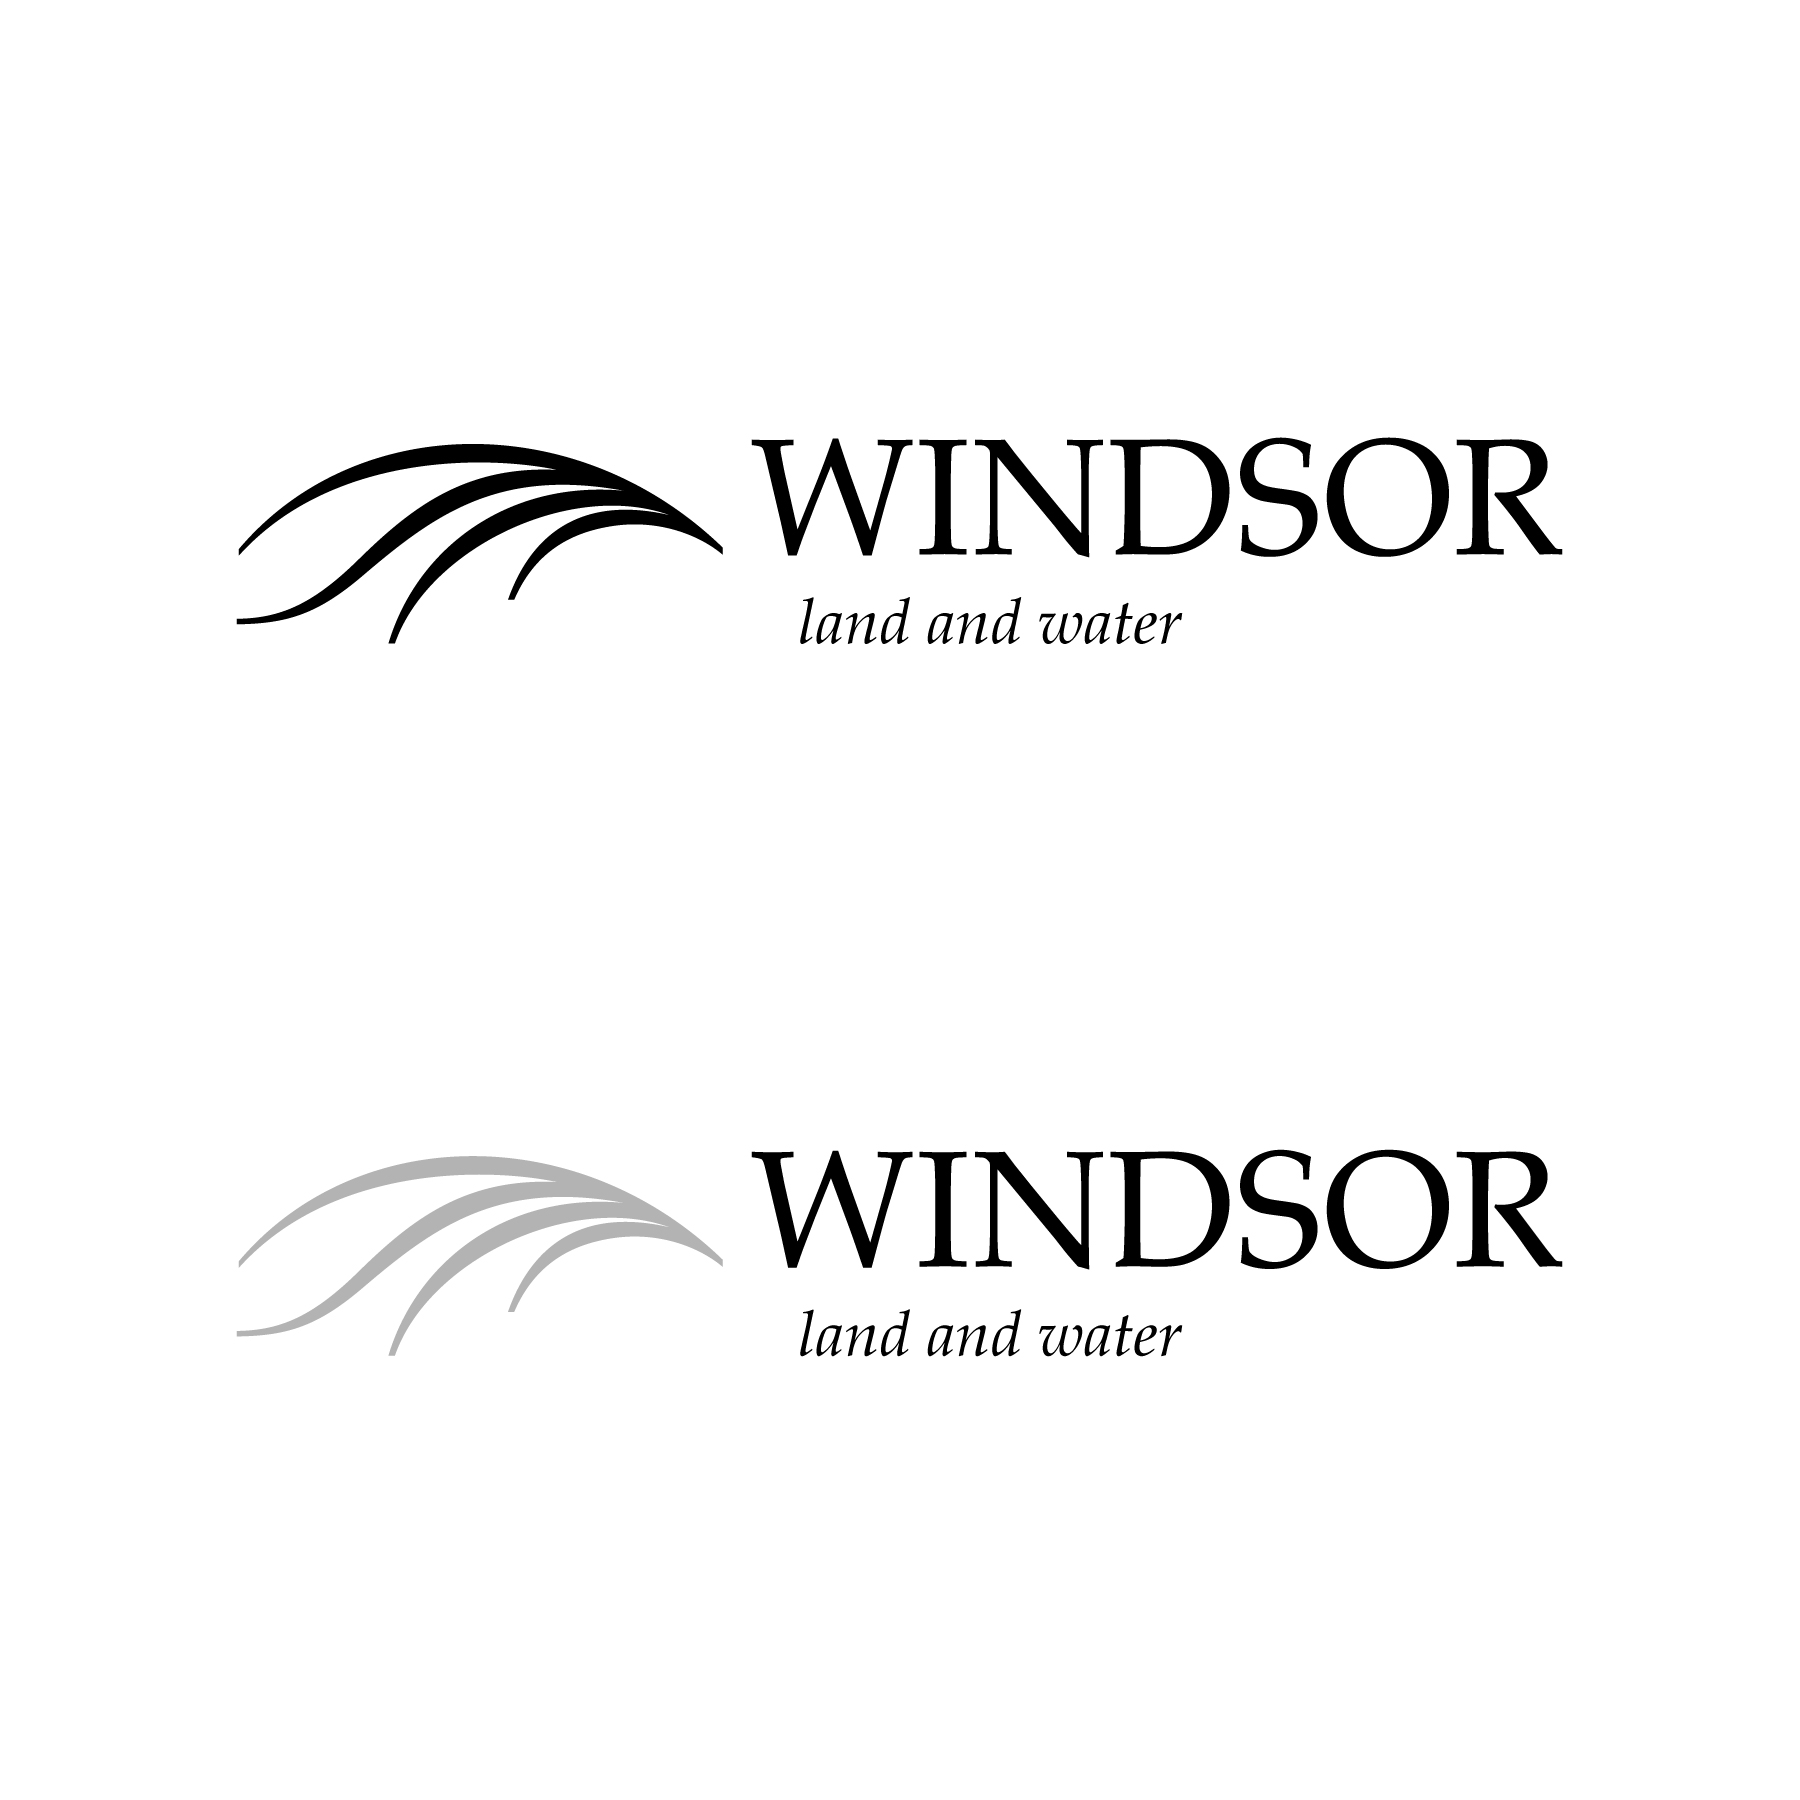 Windsor-01.jpg